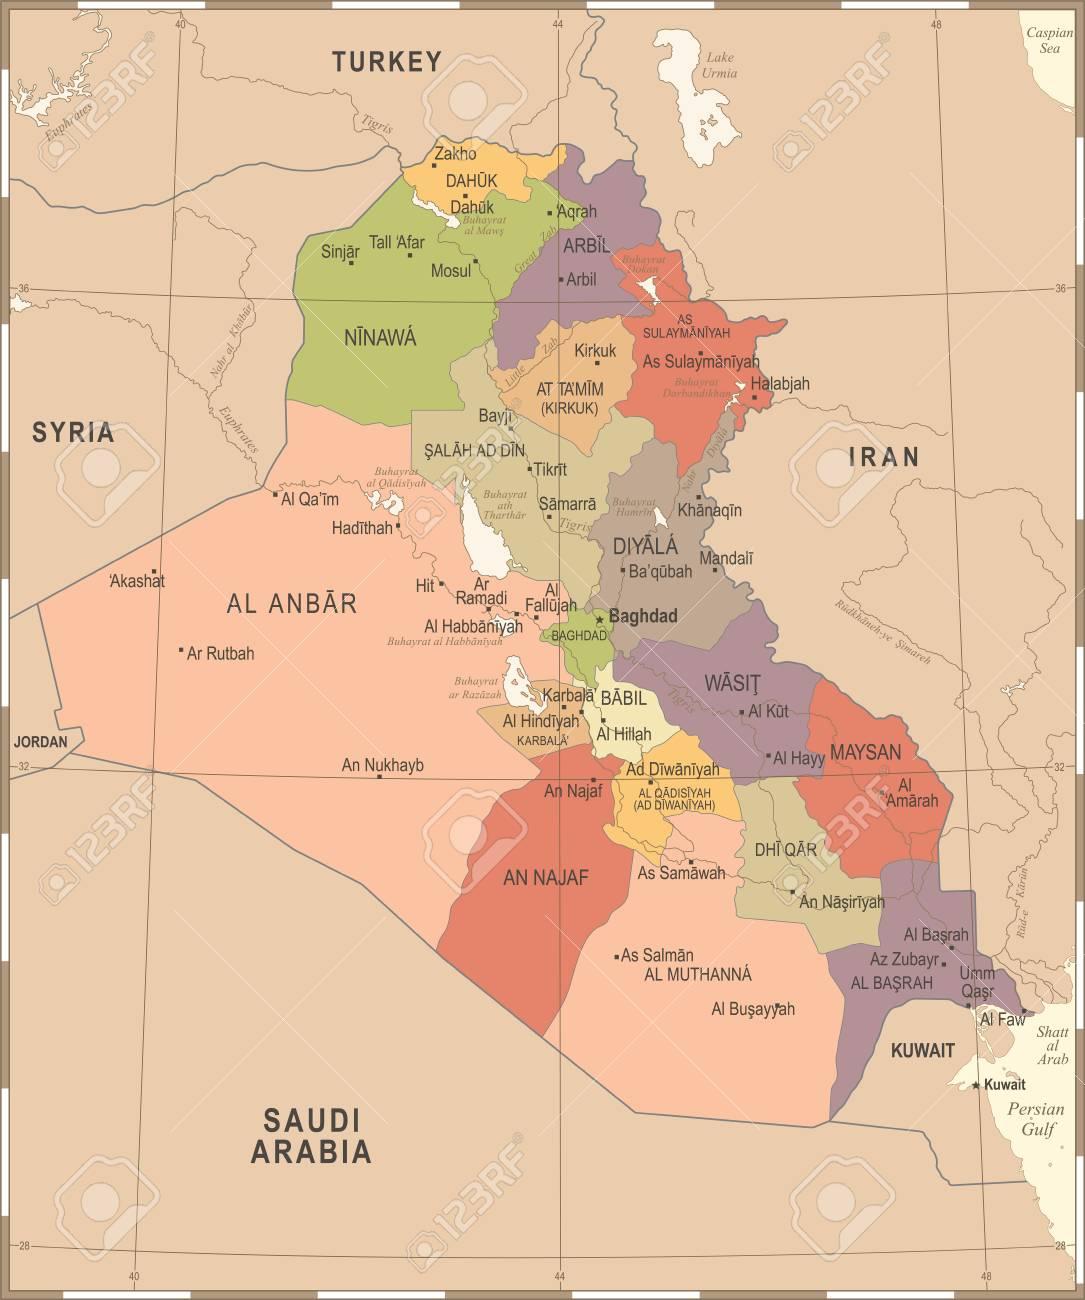 Iraq Map - Vintage High Detailed Vector Illustration